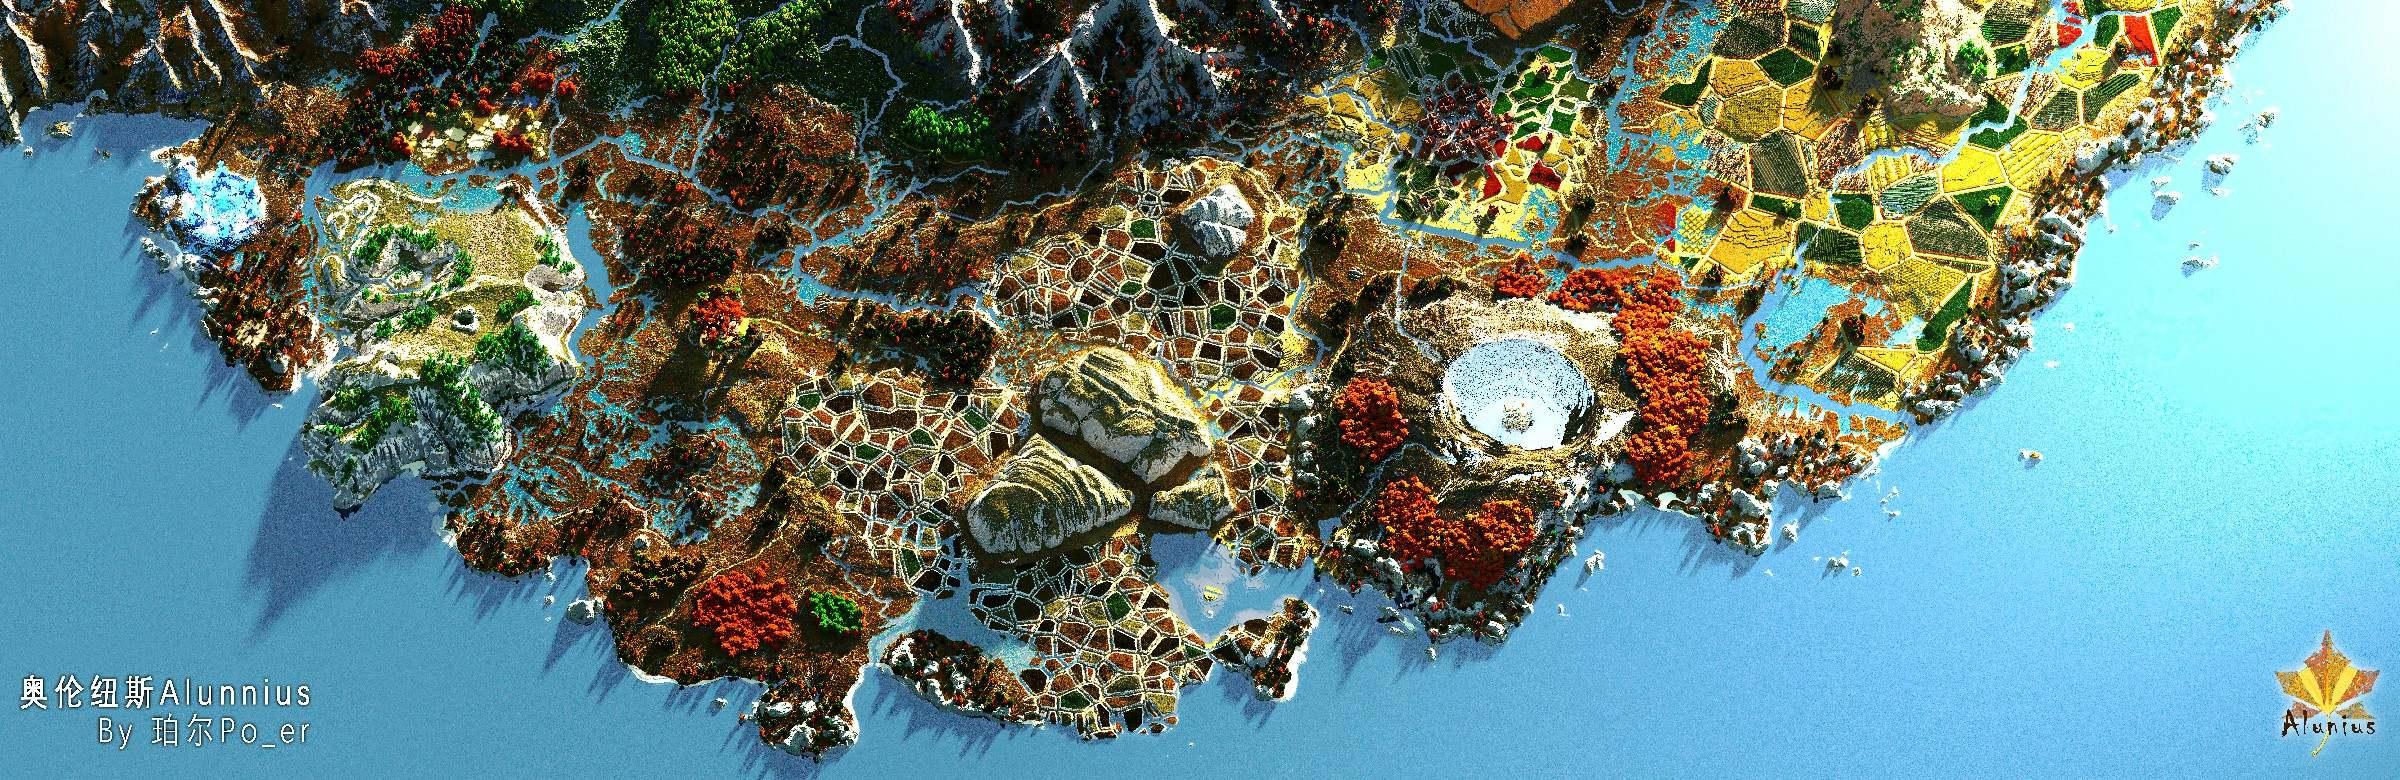 Alunnius - 6k*6k survival map Minecraft Map